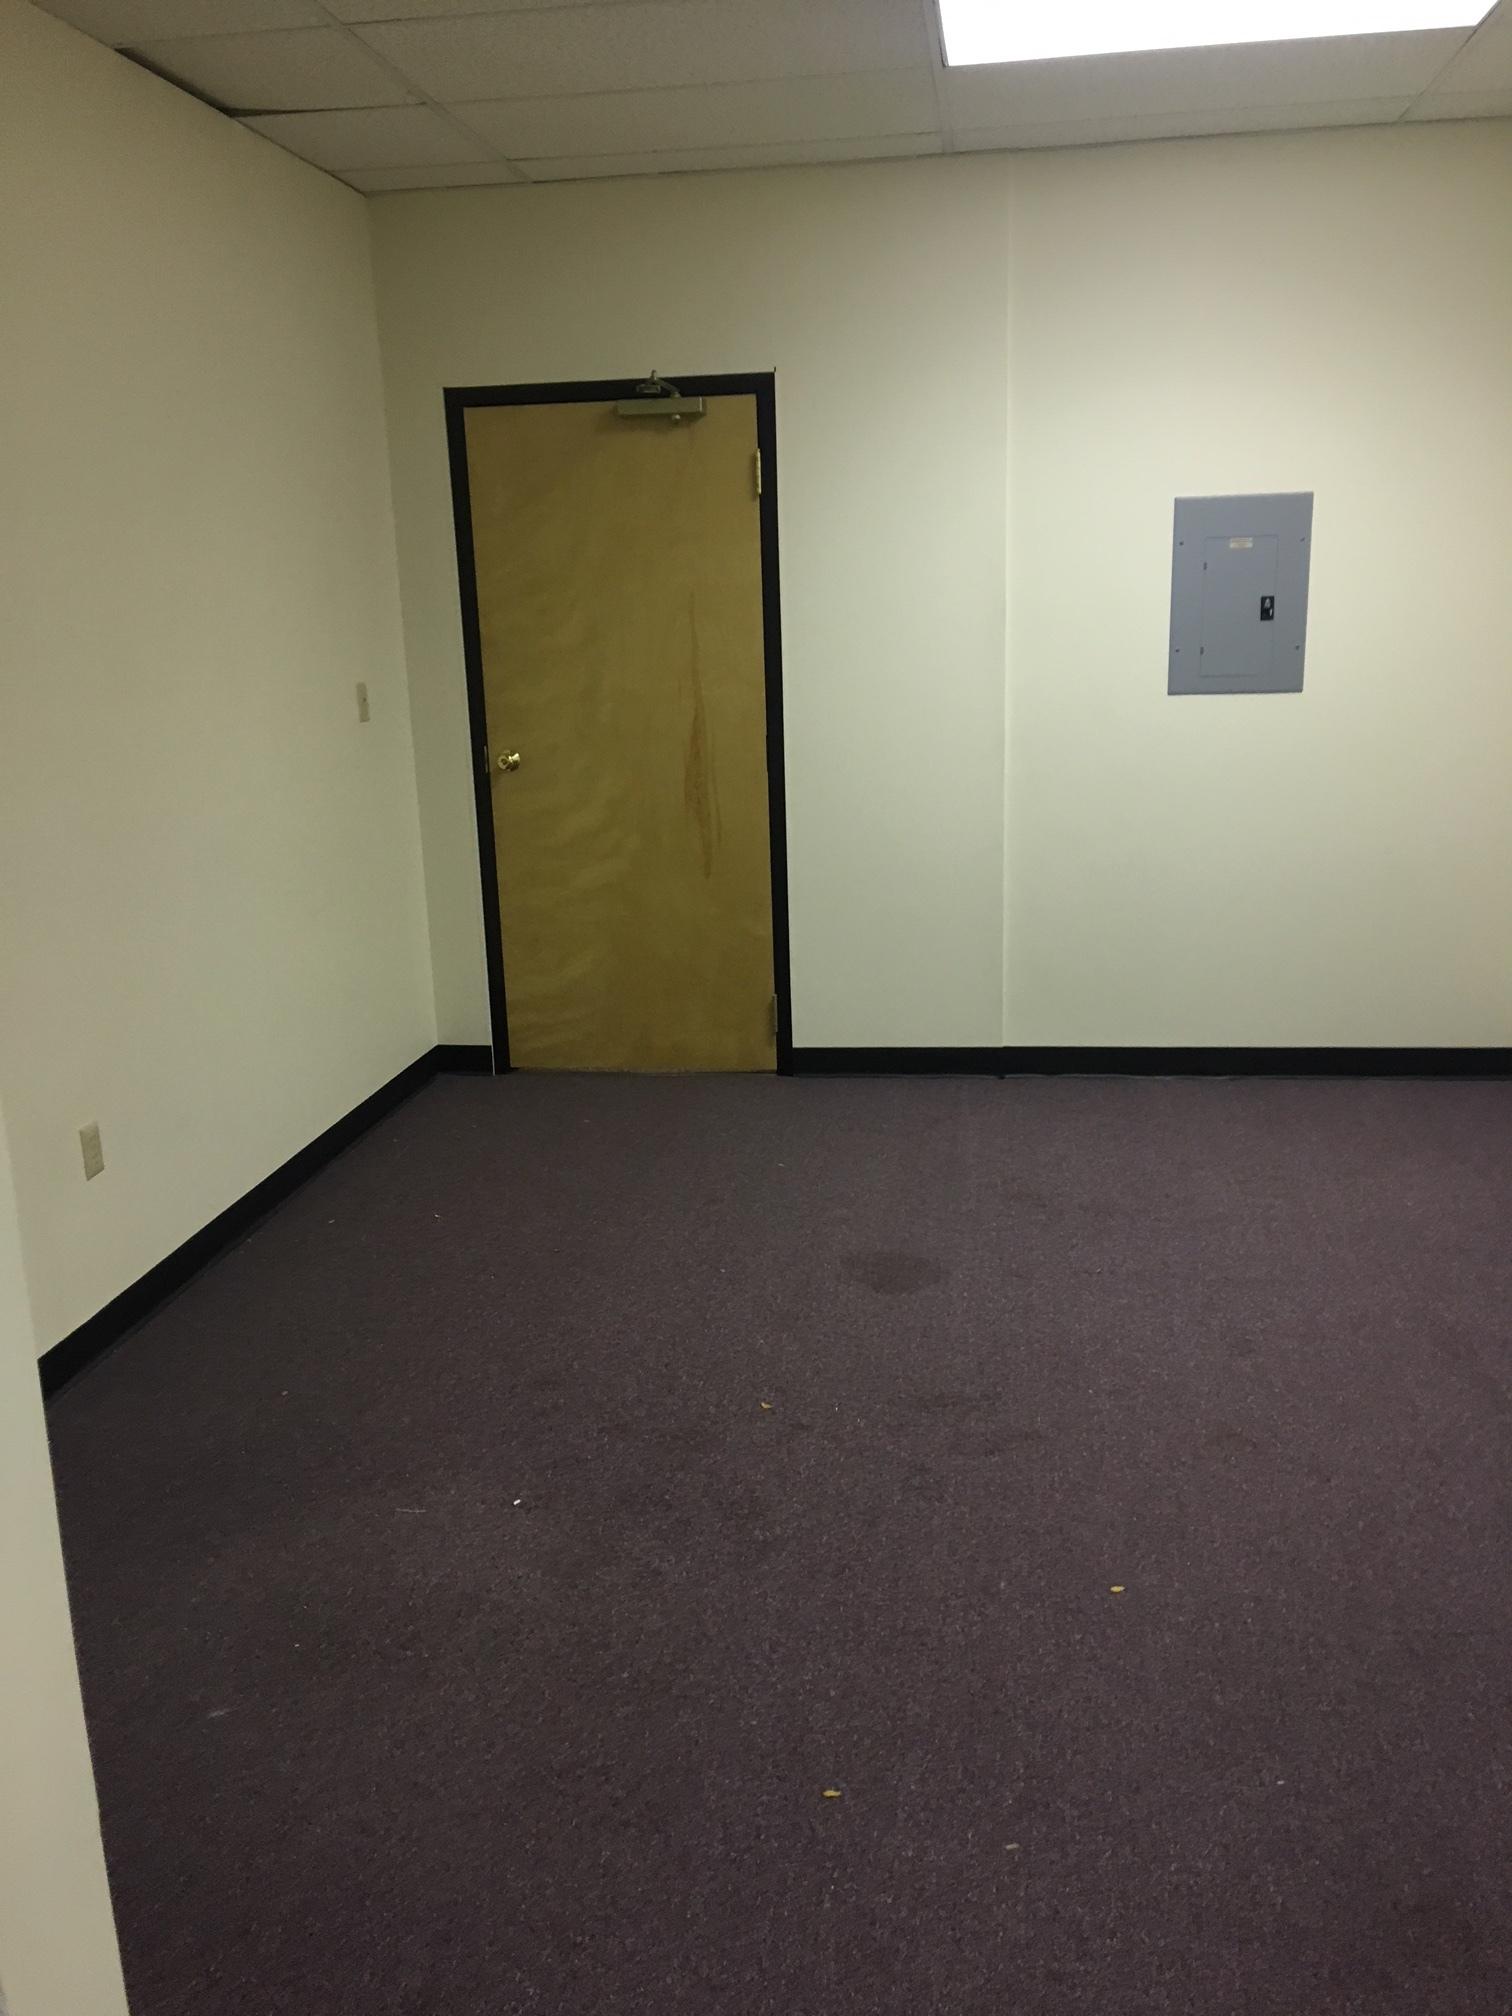 10-20 main vacant space 2.JPG